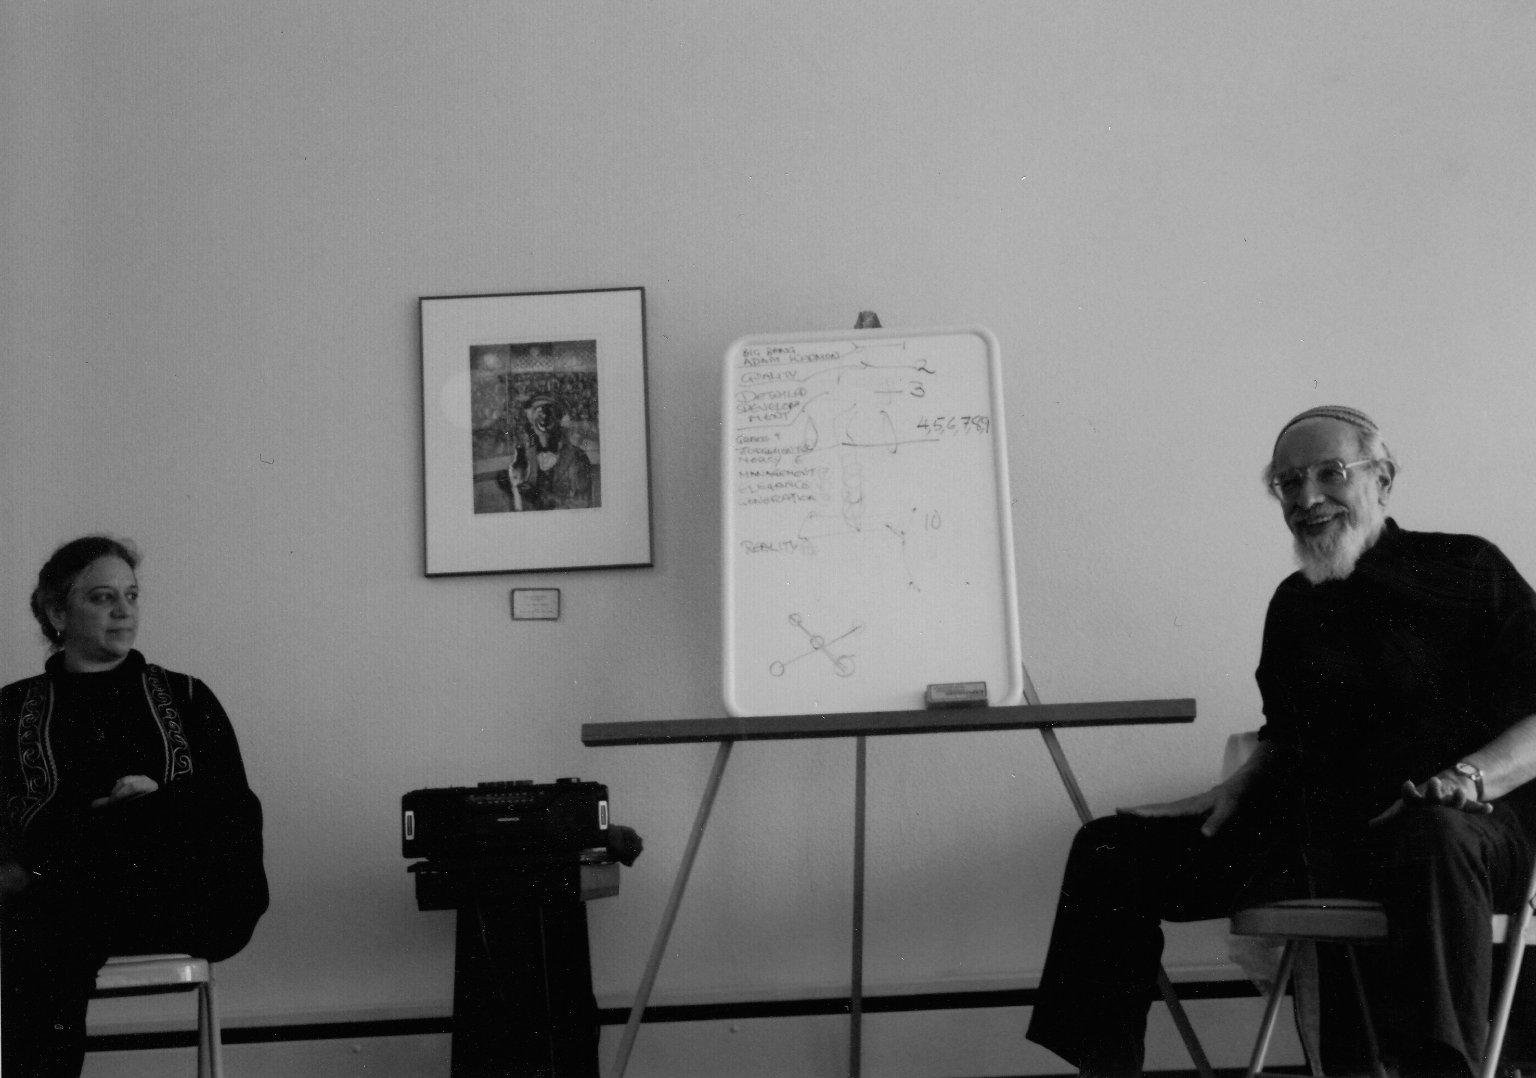 Rabbi Zalman Schachter-Shalomi teaching with his partner, Eve Ilsen, 1990s.